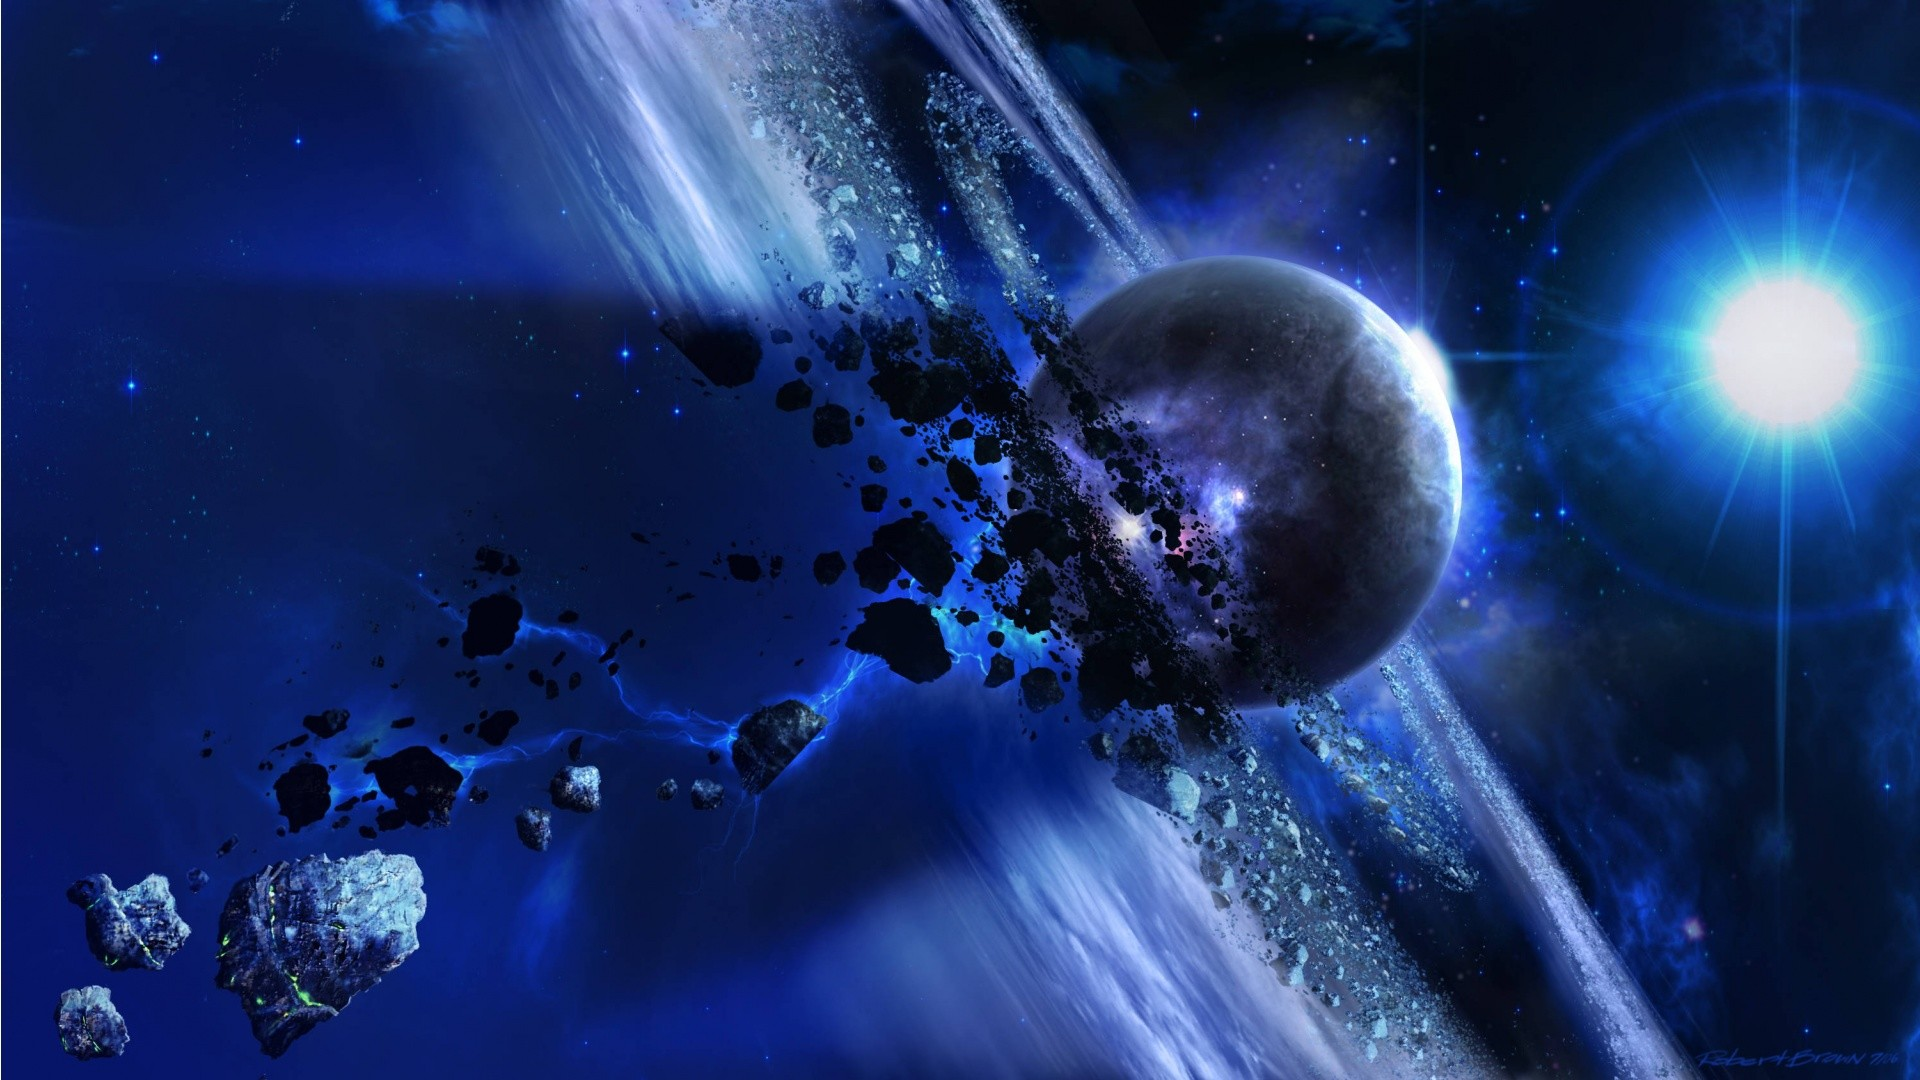 Blue Universe Resolution